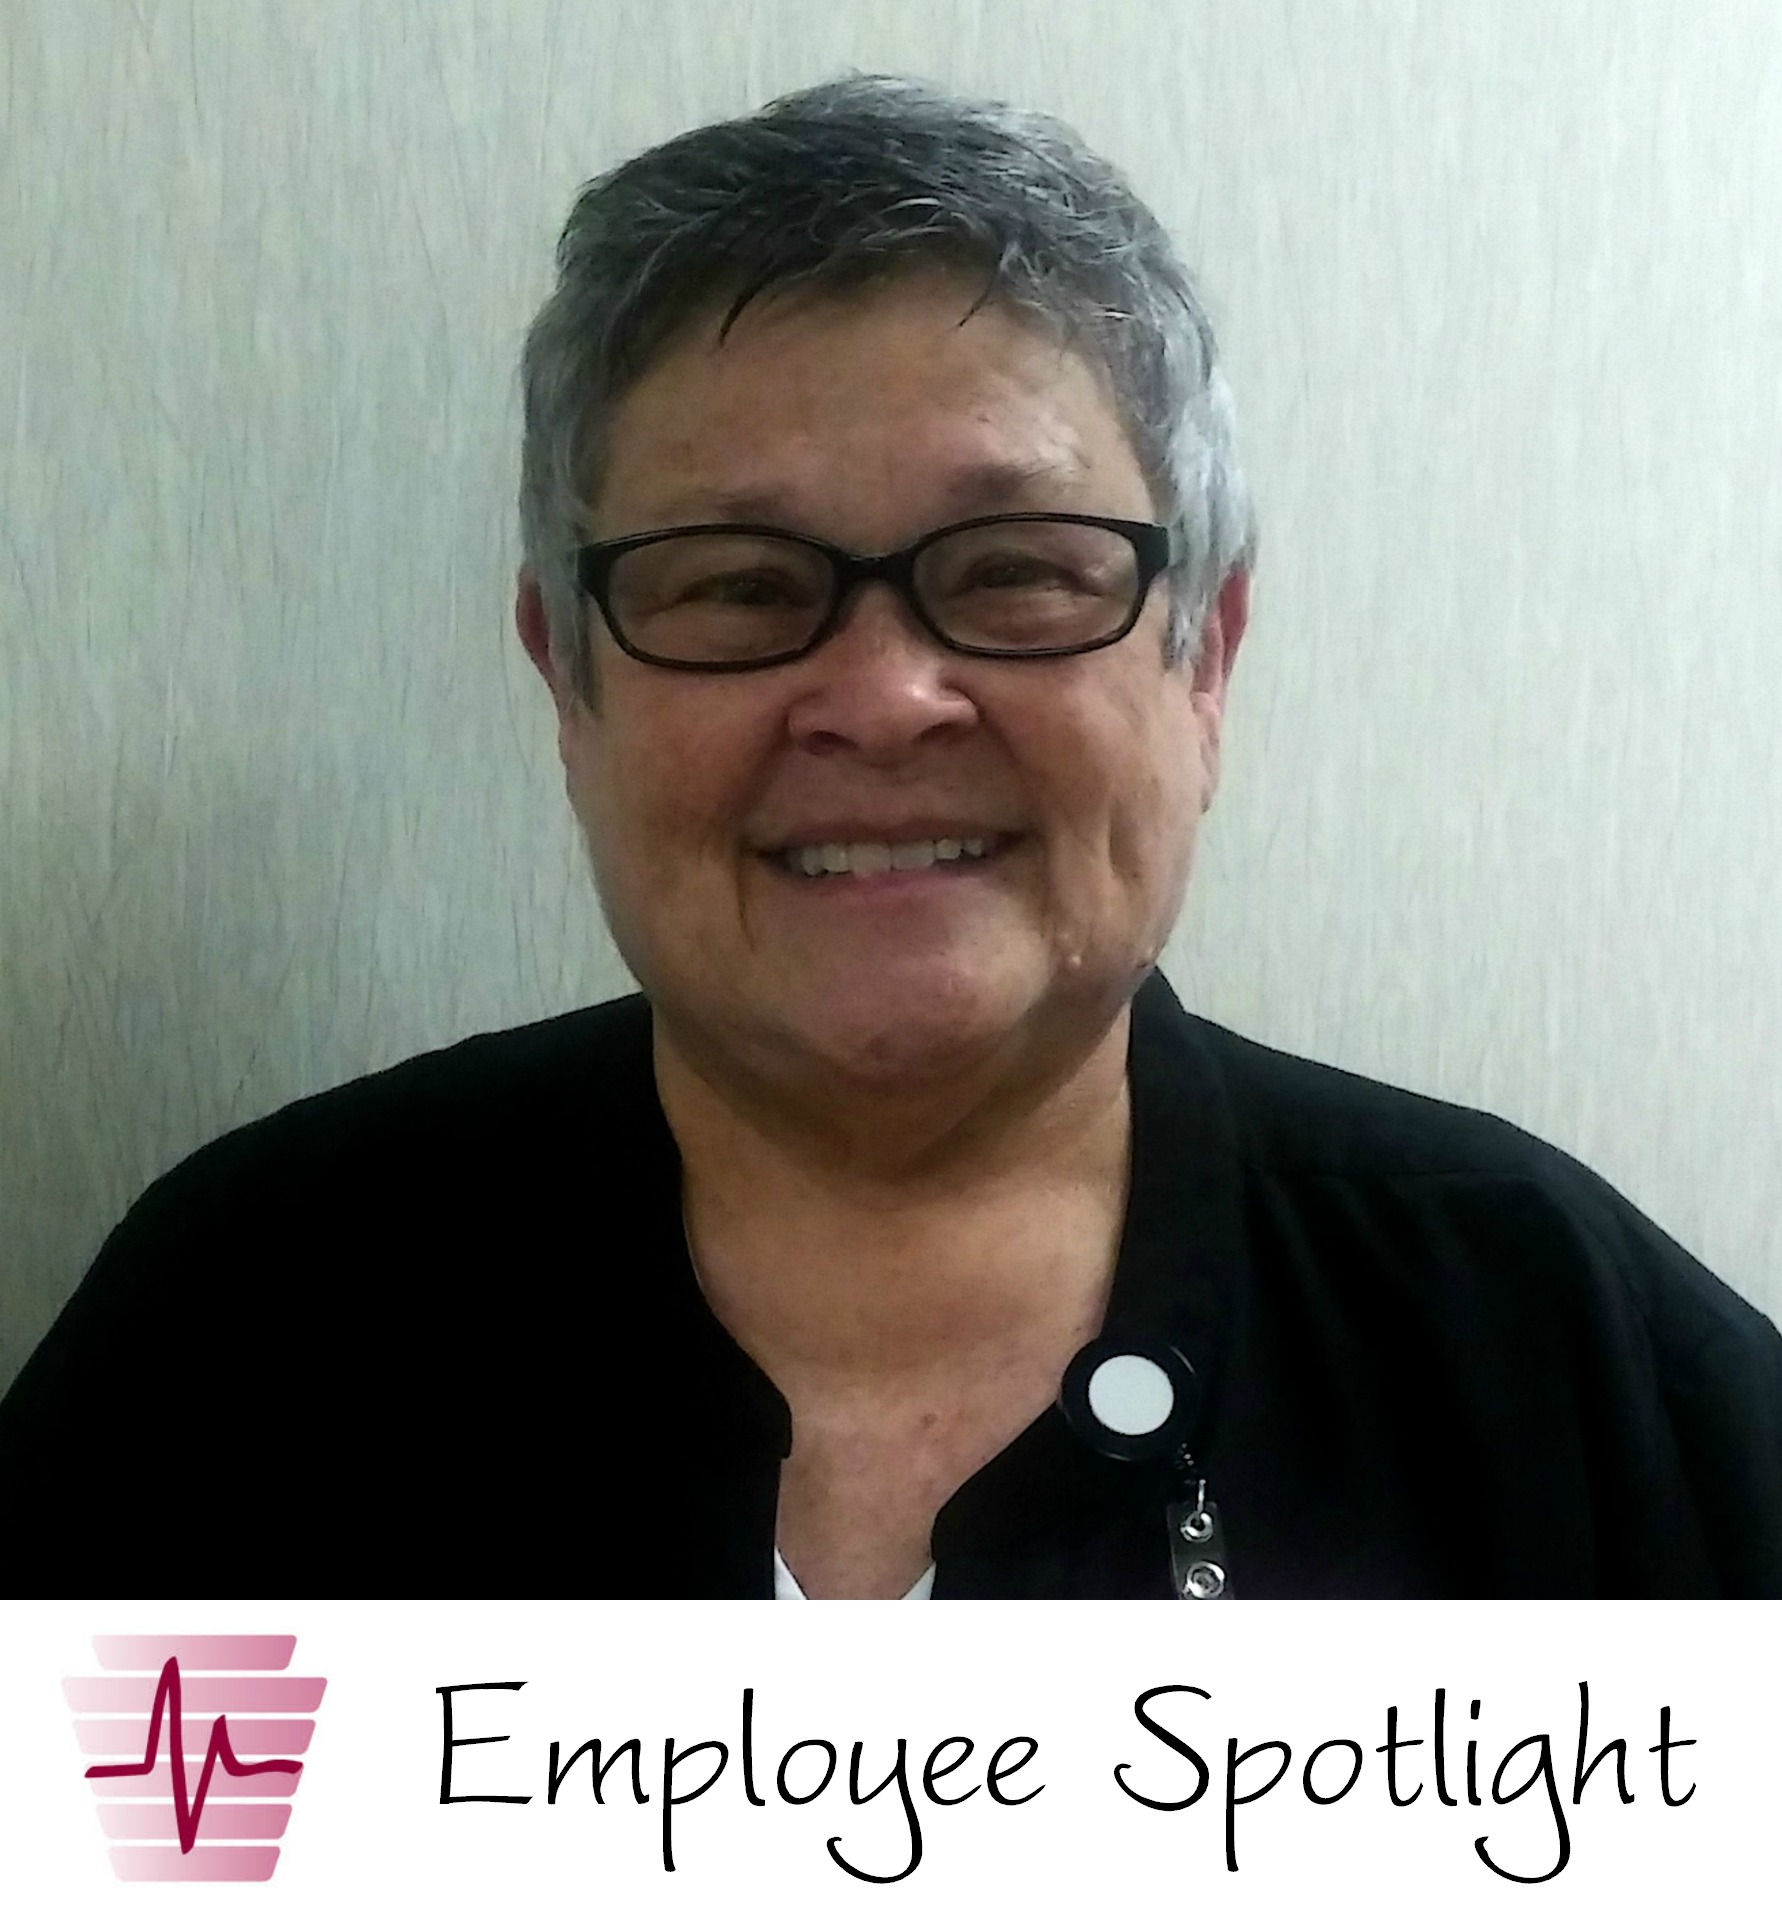 employee spotlight - joyce hockensmith